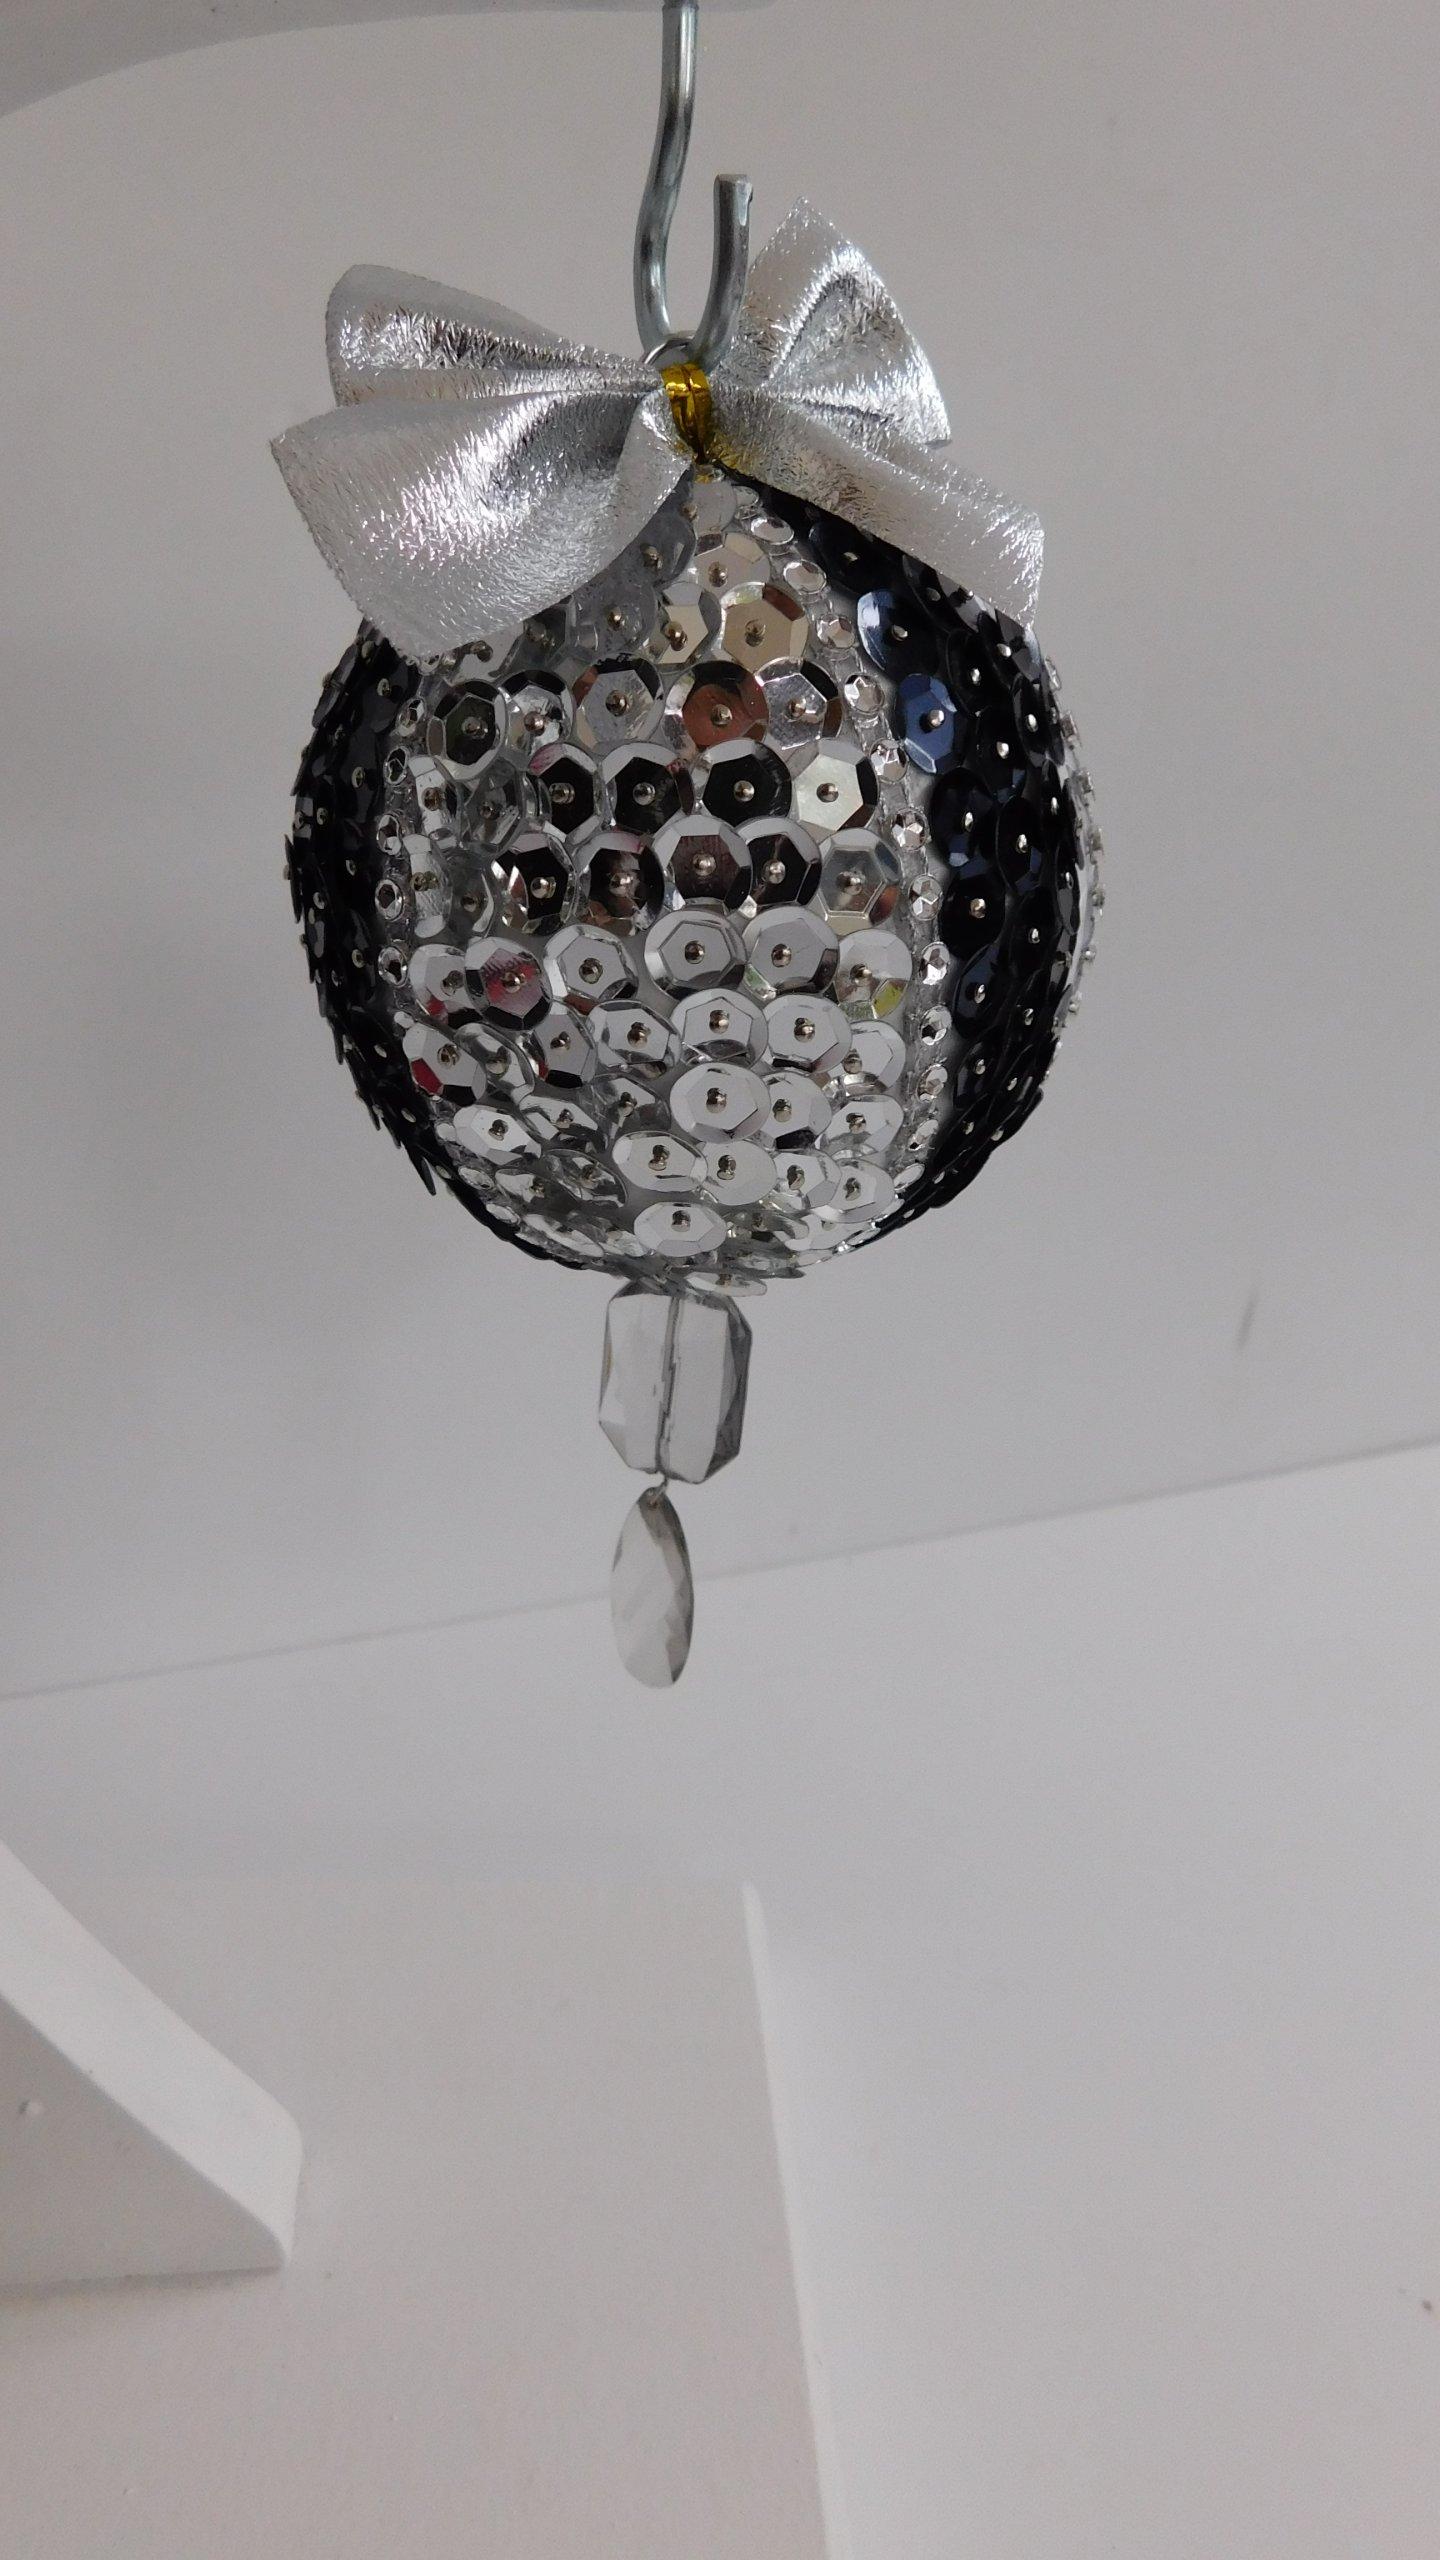 Bombki Srebrne Choinkowe Cyrkonie Krysztalki 16cm 7501189500 Allegro Pl